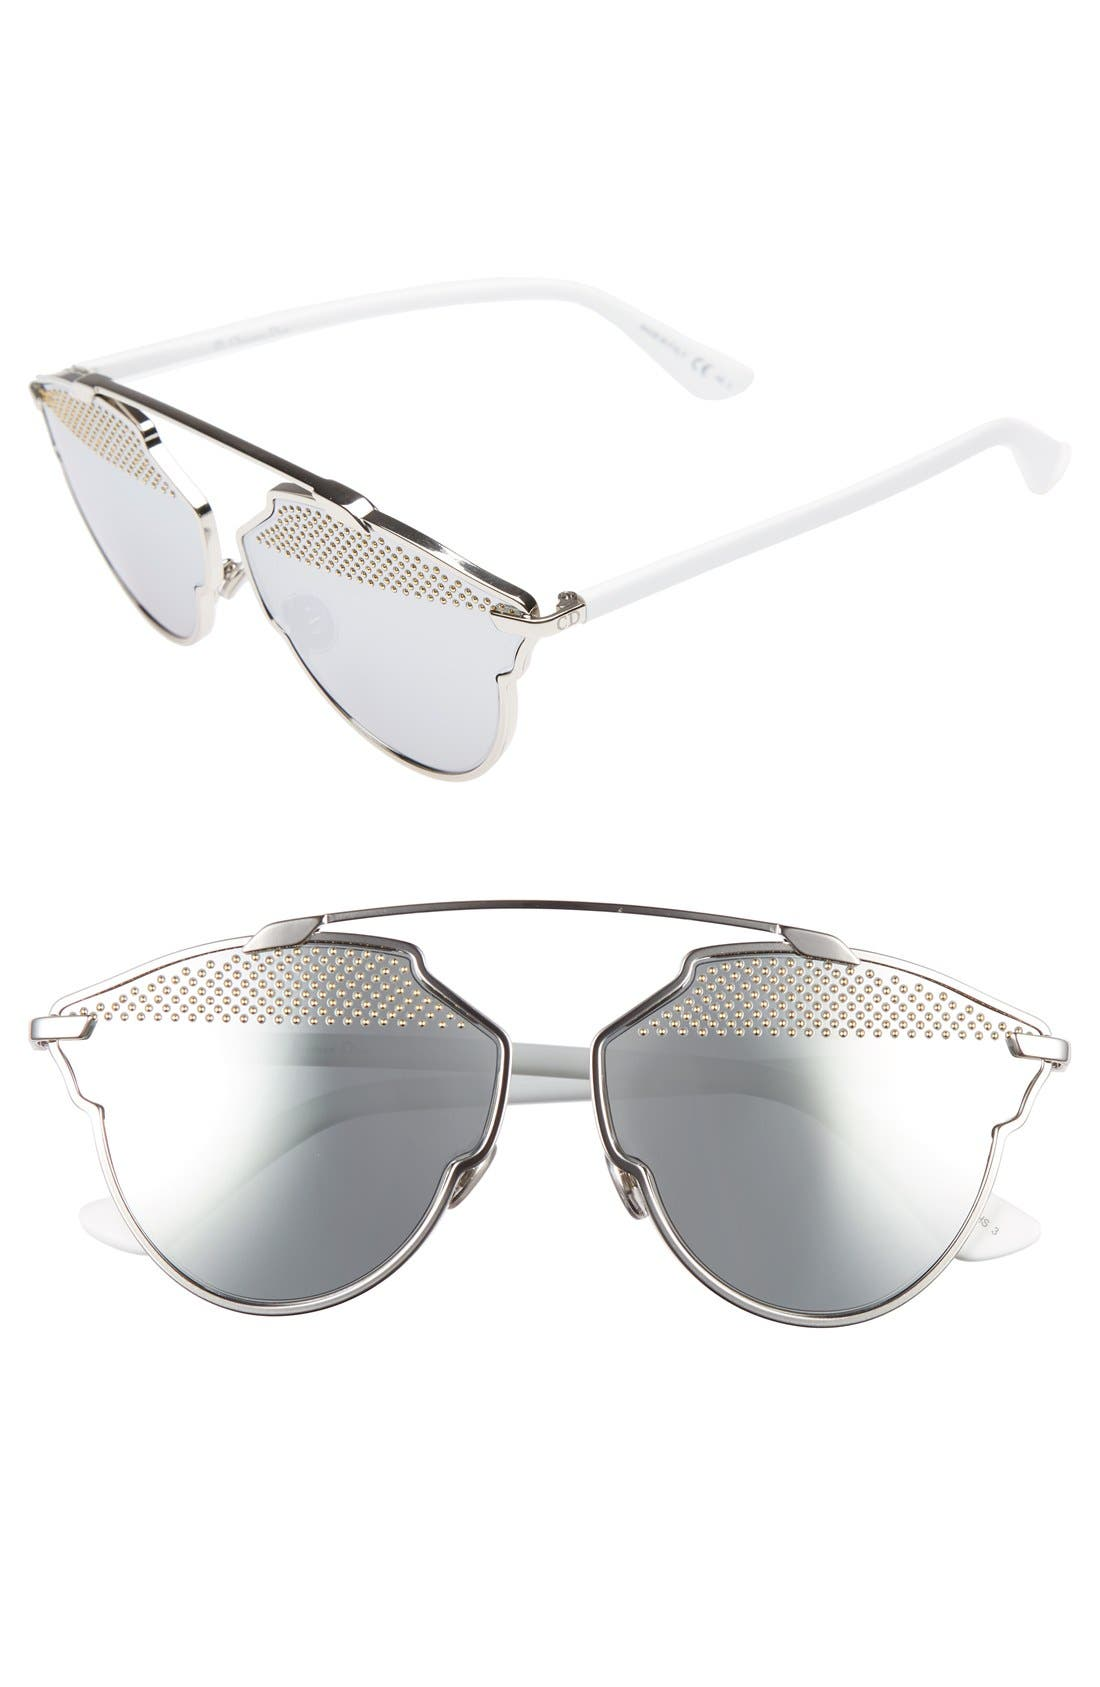 DIOR So Real Studded 59mm Brow Bar Sunglasses